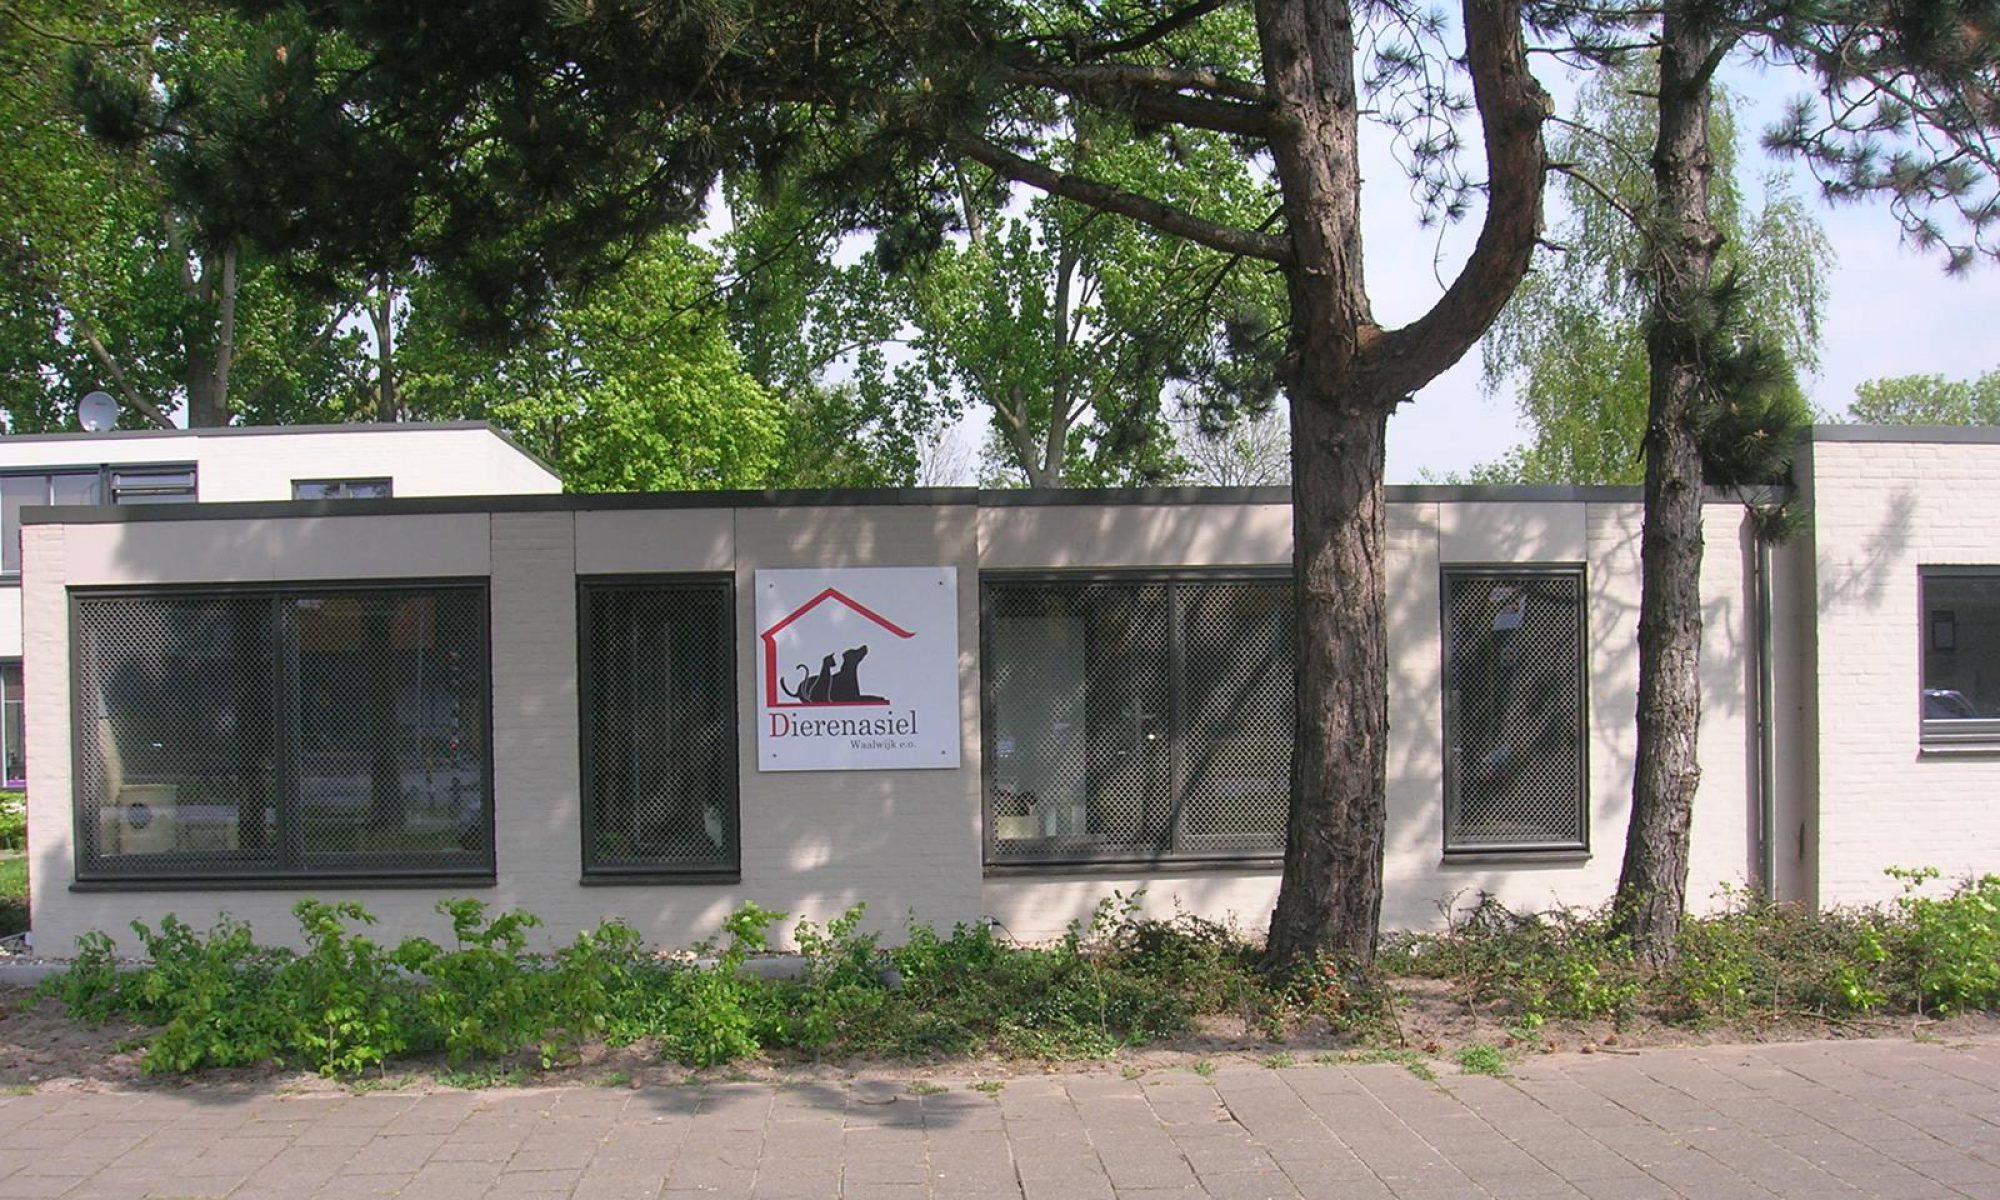 Dierenasiel Waalwijk e.o.